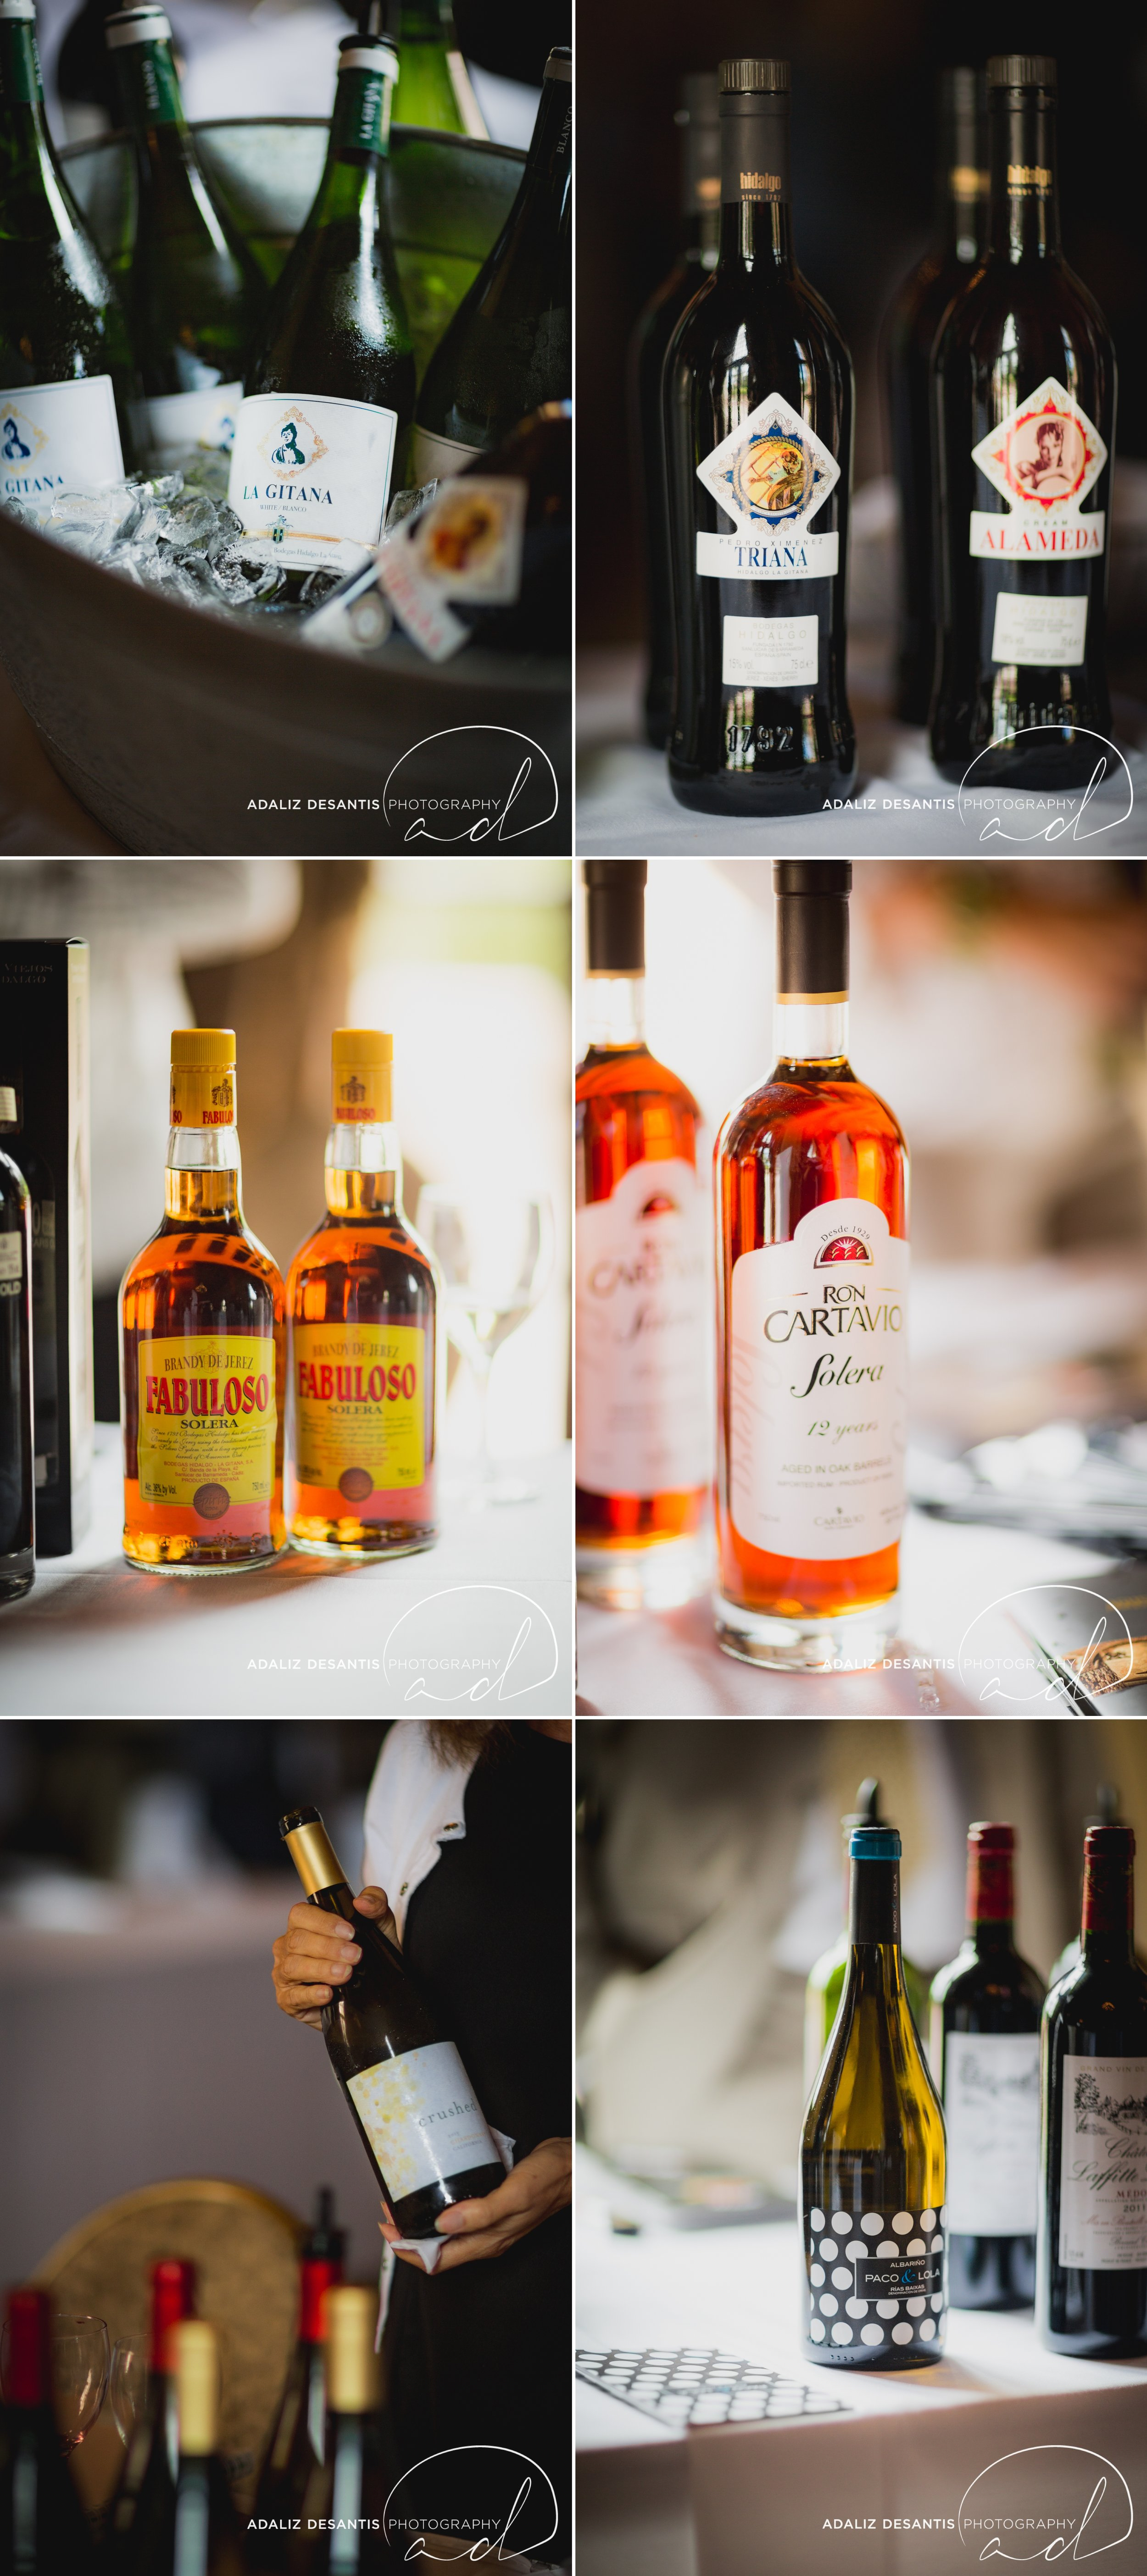 hidalgo imports anniversary wine spirits tasting biltmore hotel coral gables florida miami 4.jpg